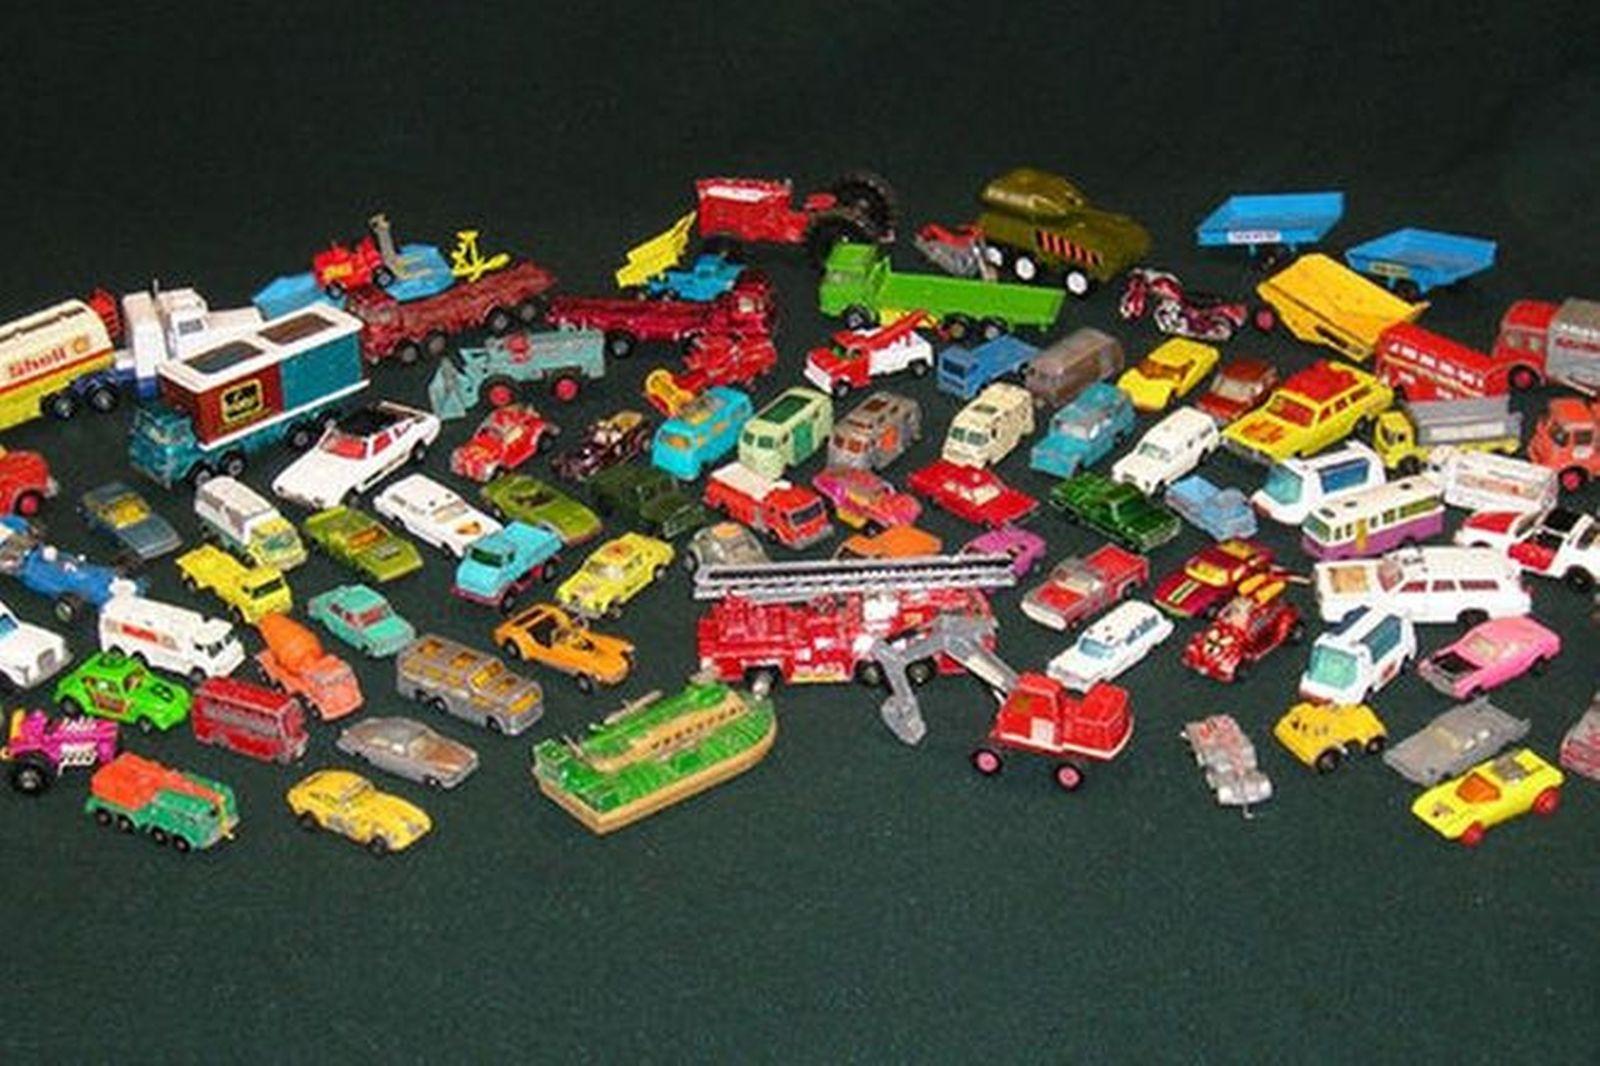 Model Cars - 96 Assorted Matchbox Style Cars & Trucks